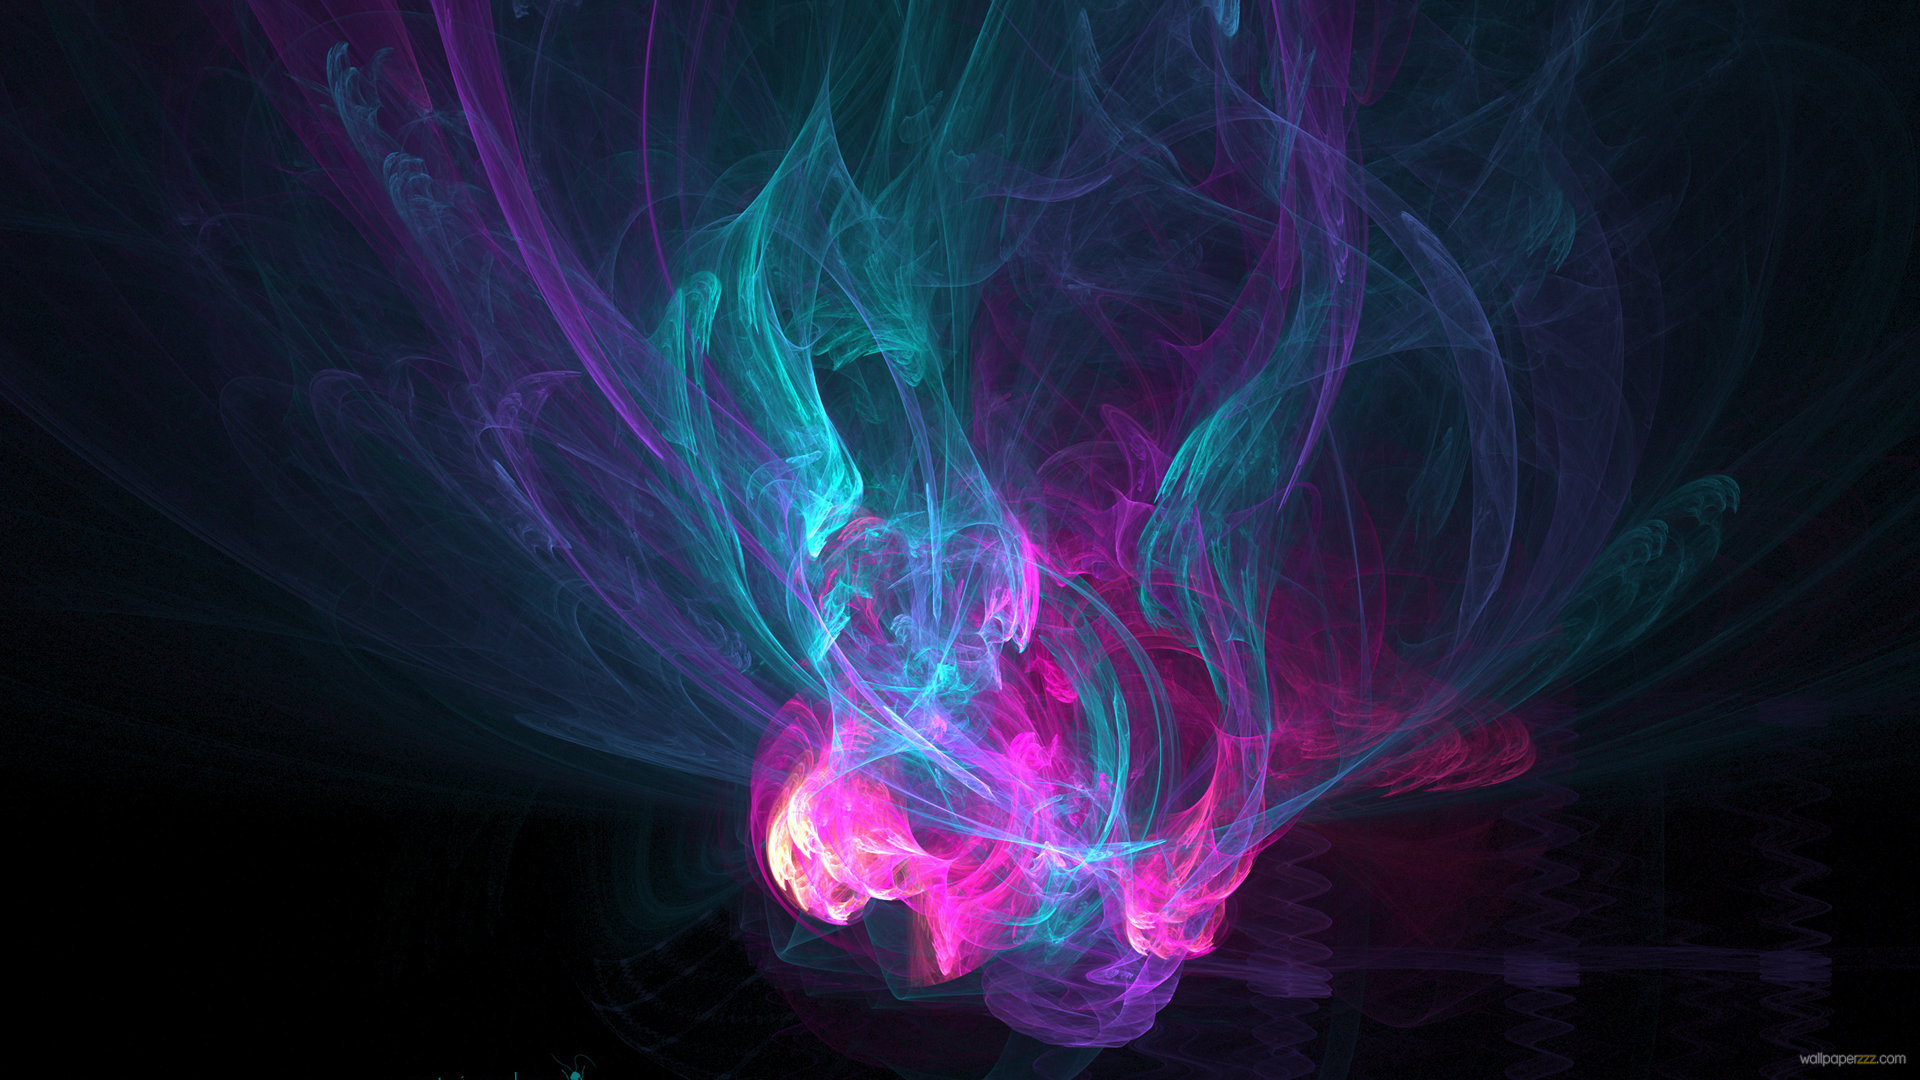 Download Abstract Fire HD Wallpaper Wallpaper 1920x1080